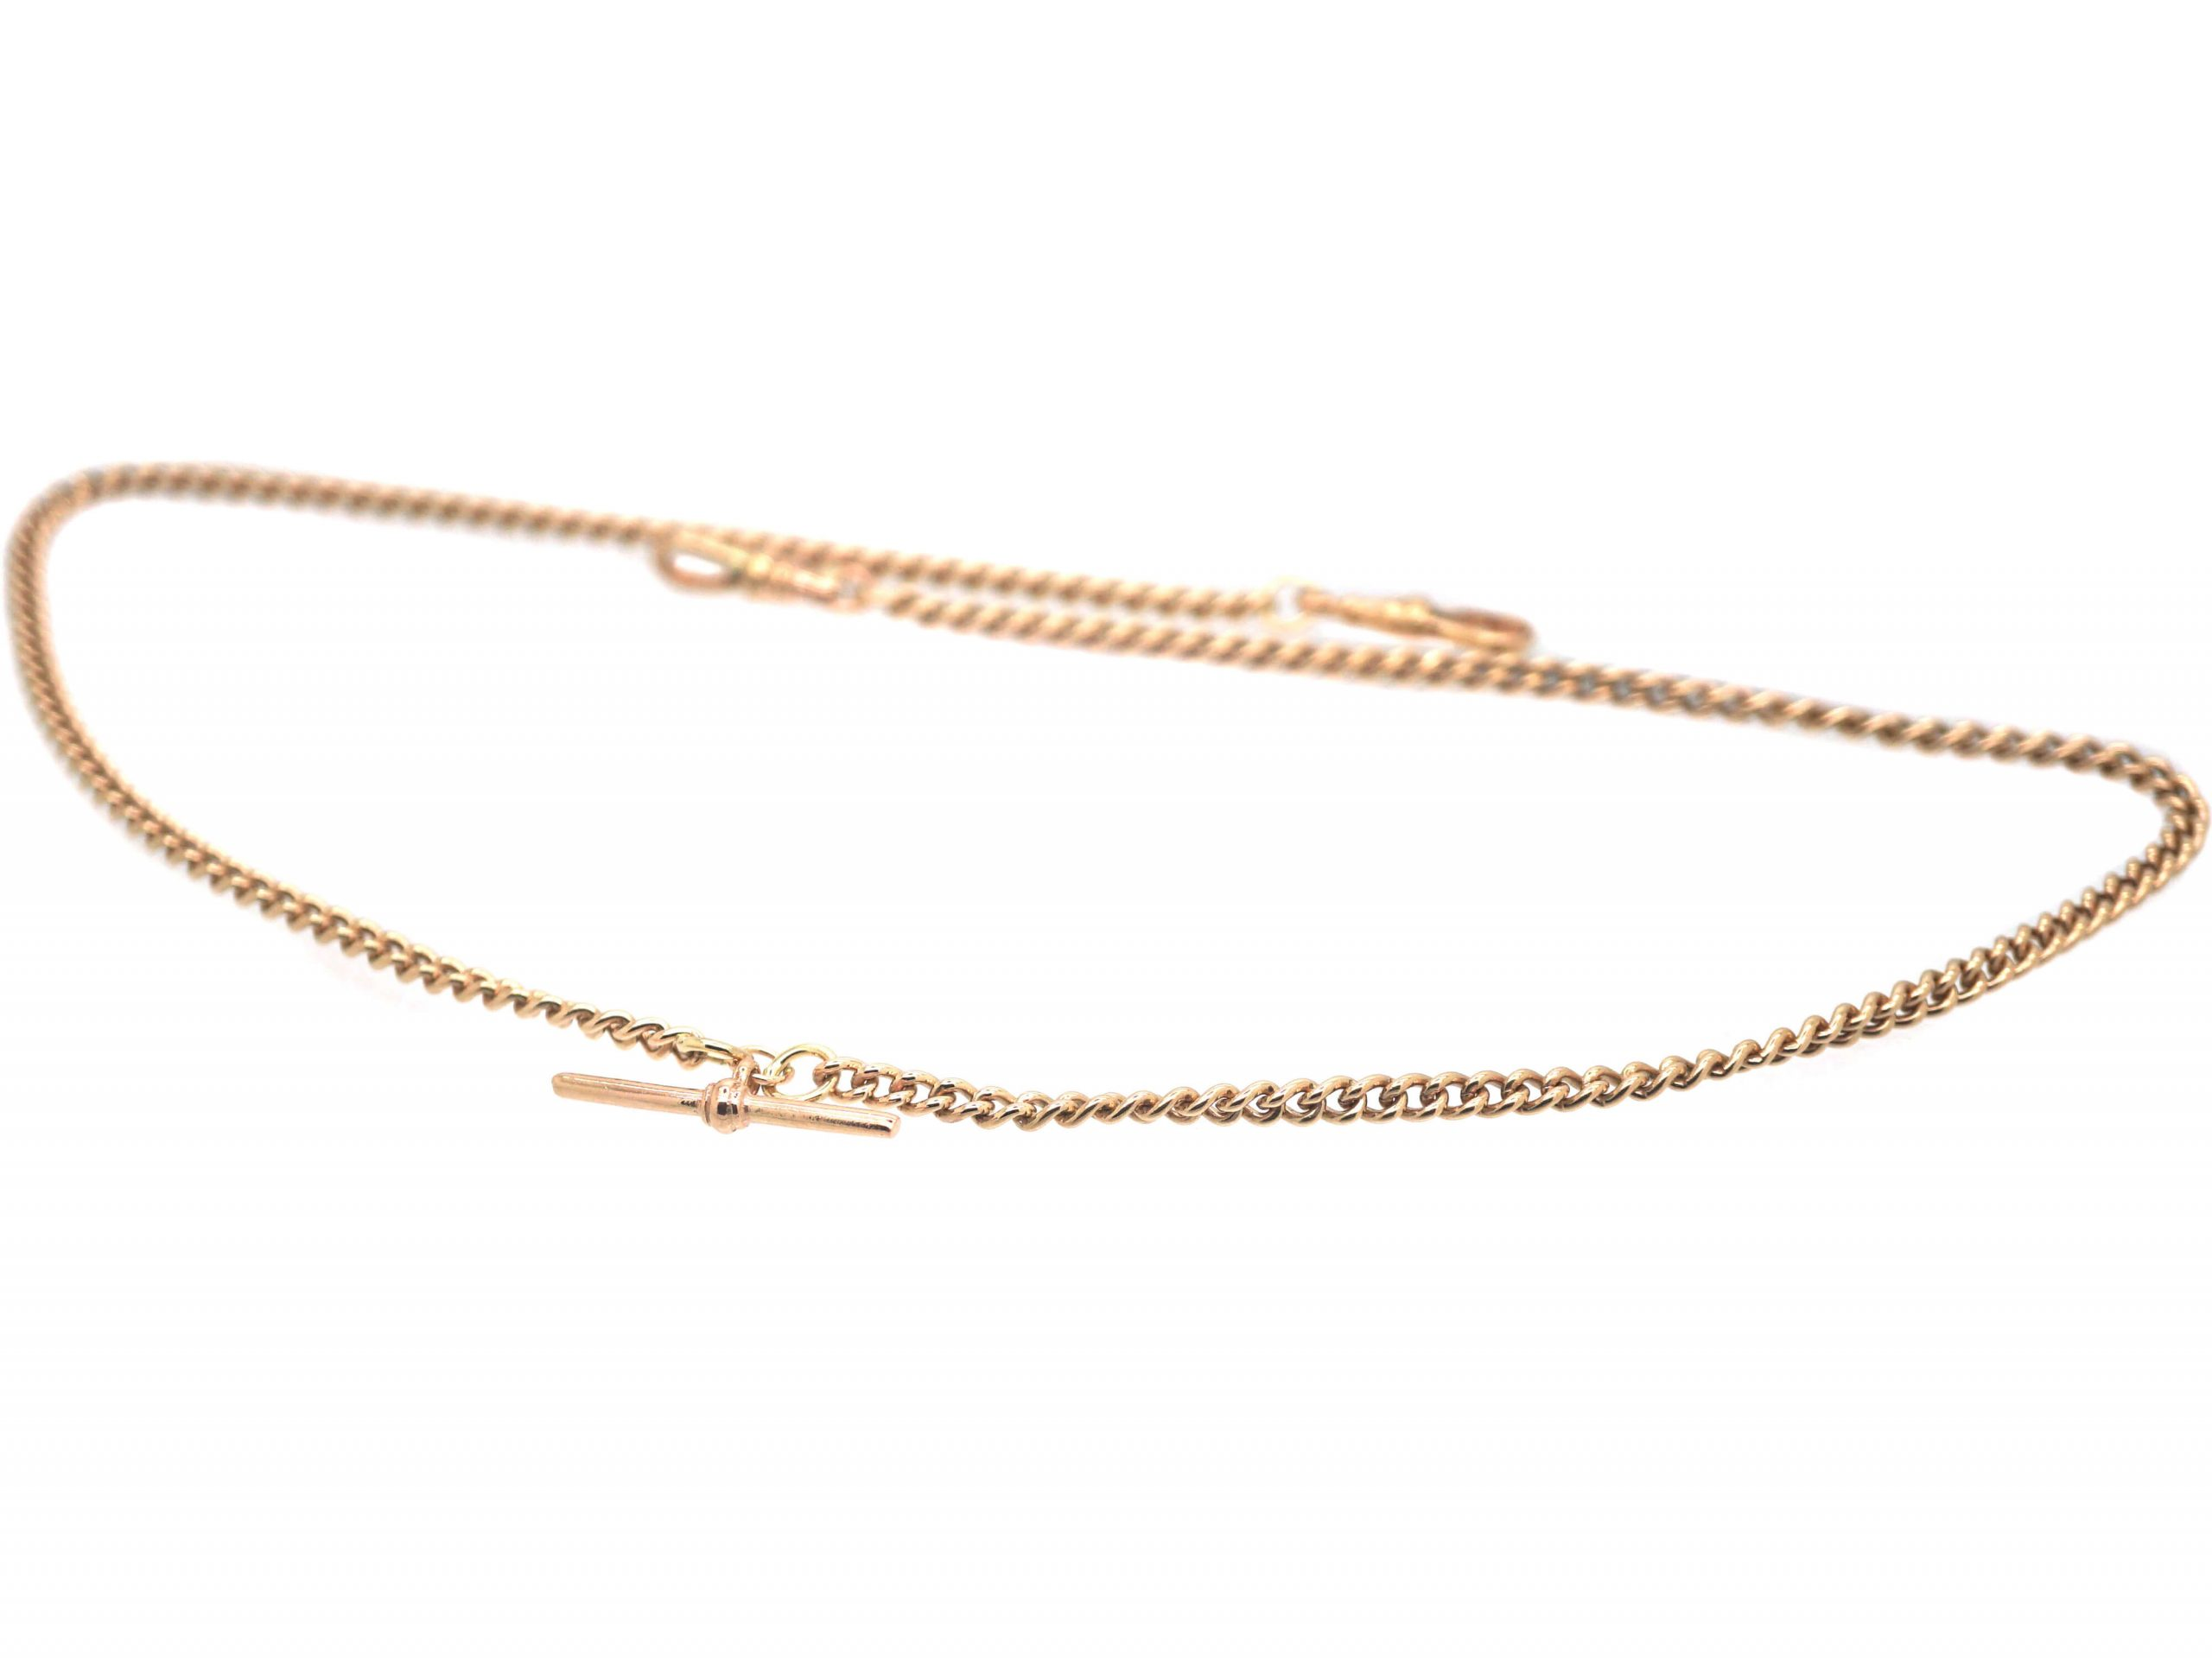 Edwardian 9ct Gold Albert Chain